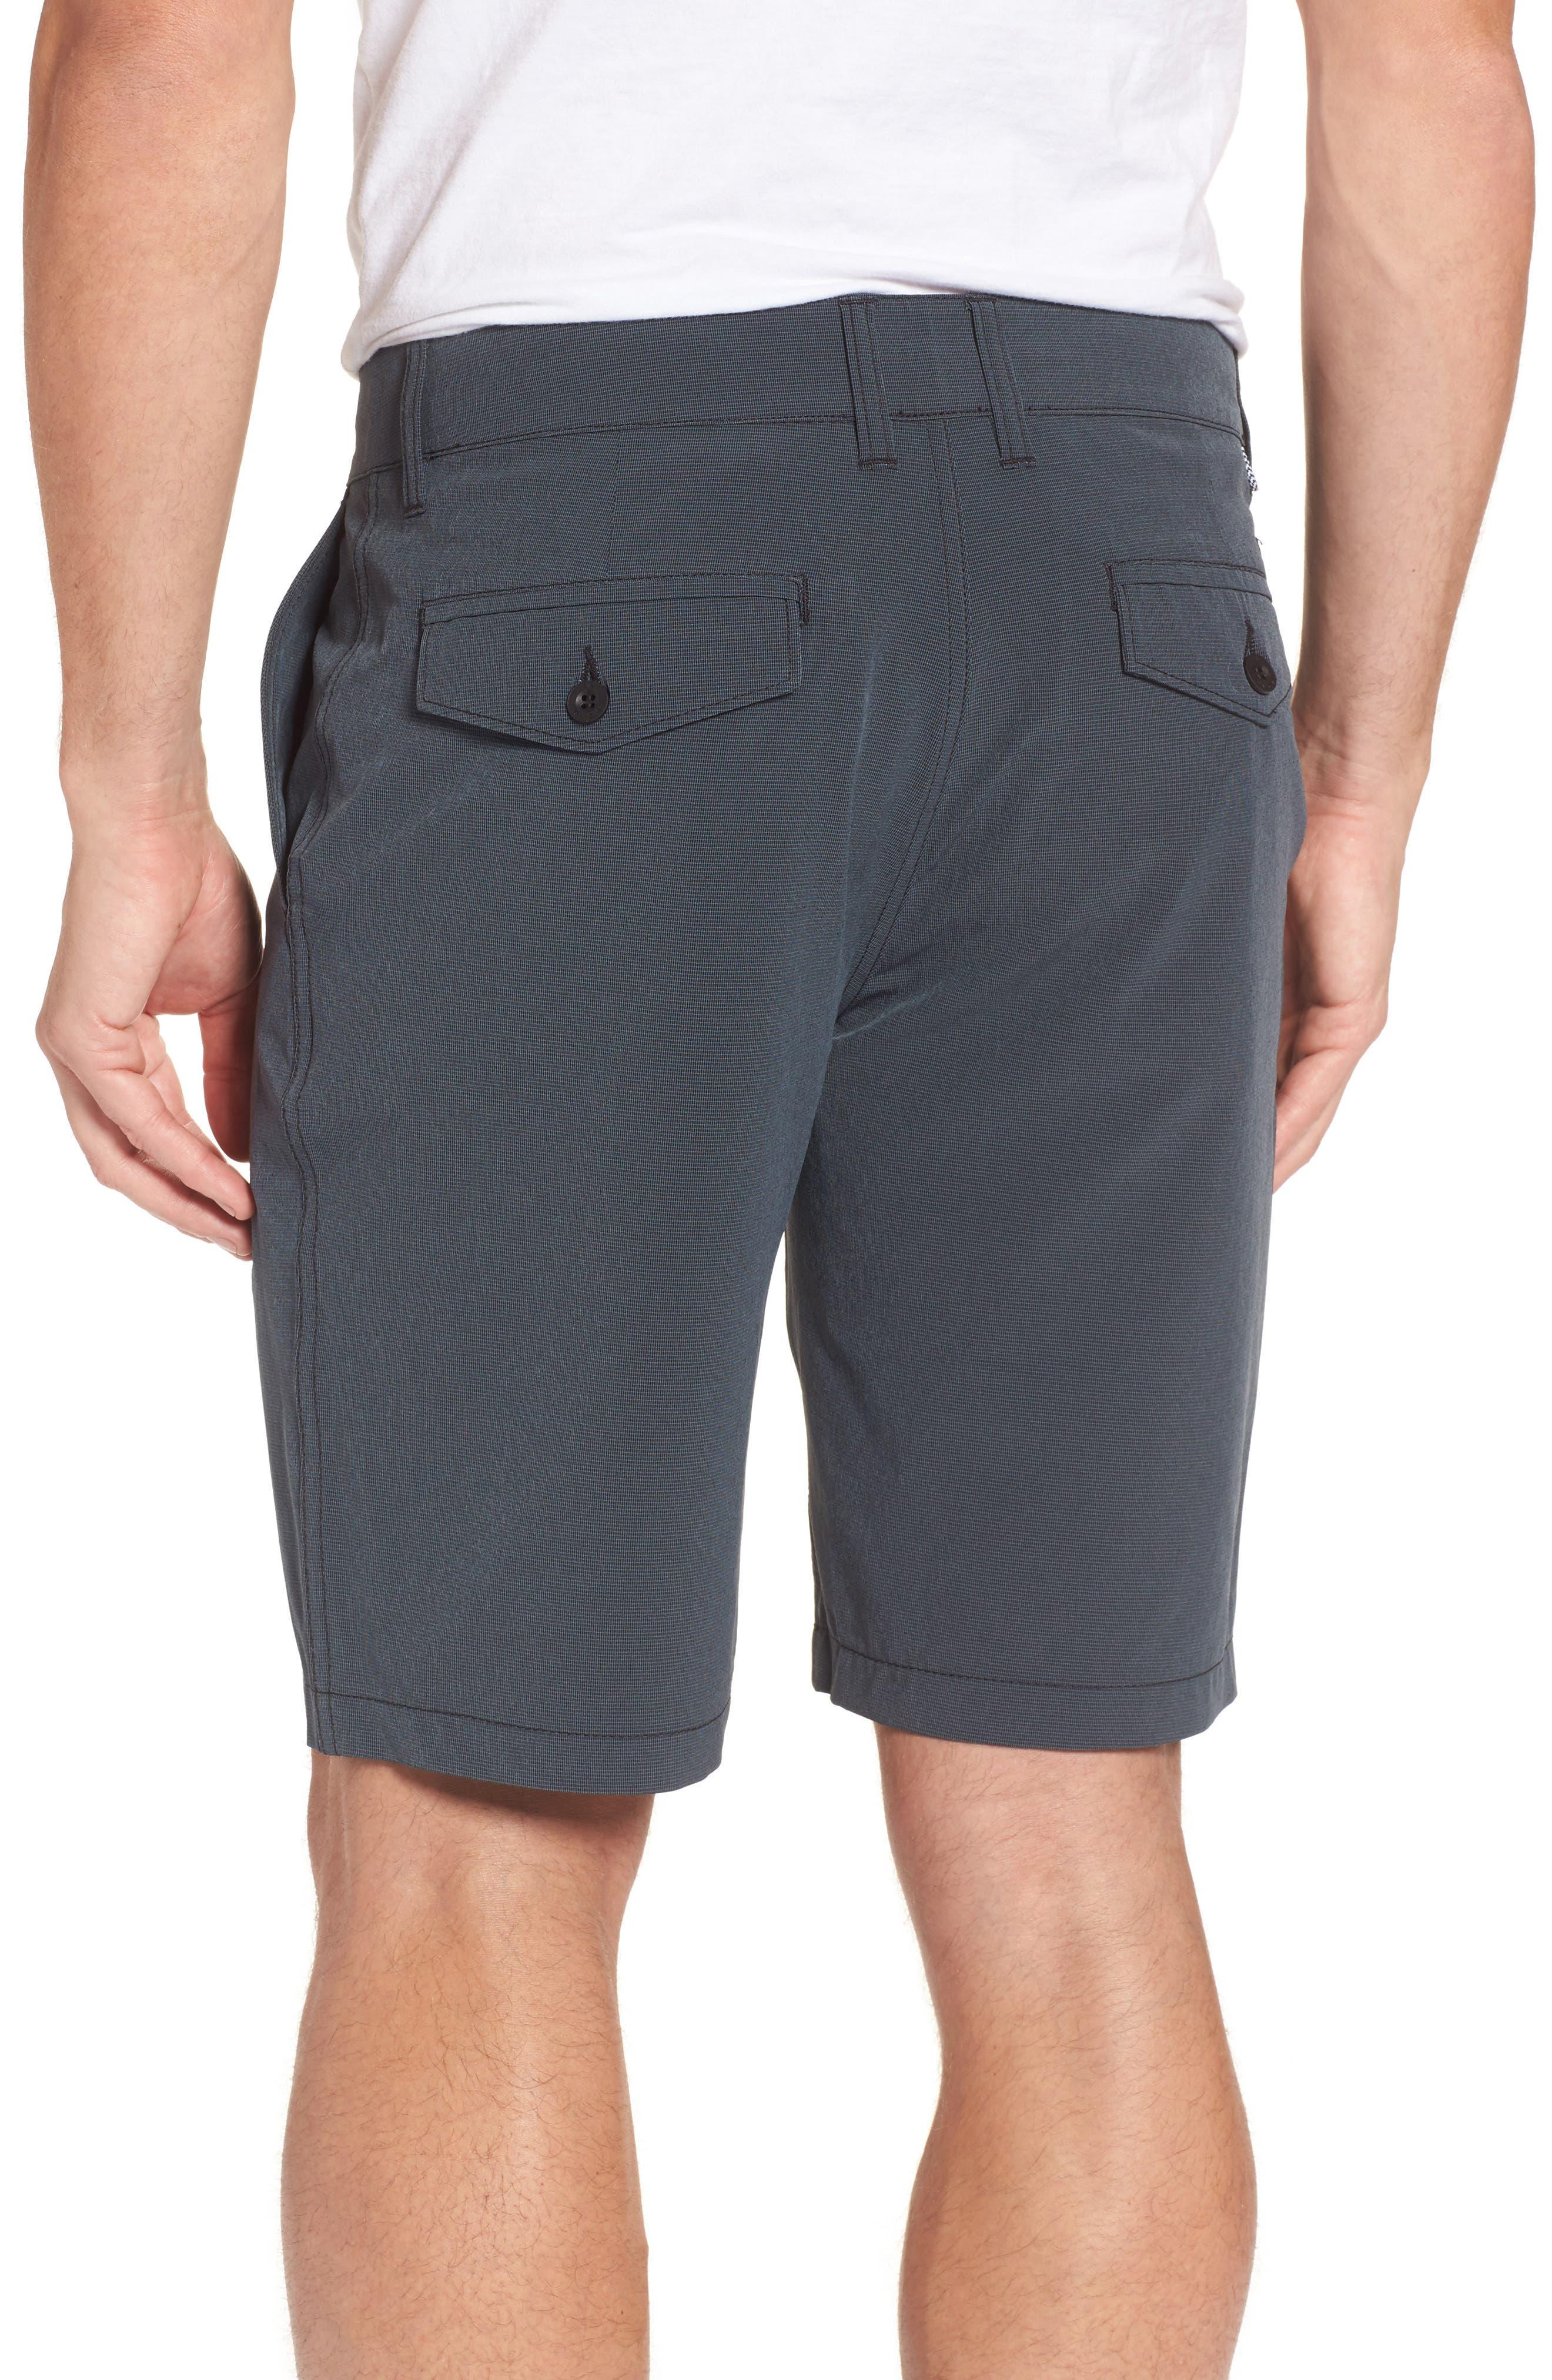 Grid Hybrid Shorts,                             Alternate thumbnail 2, color,                             001